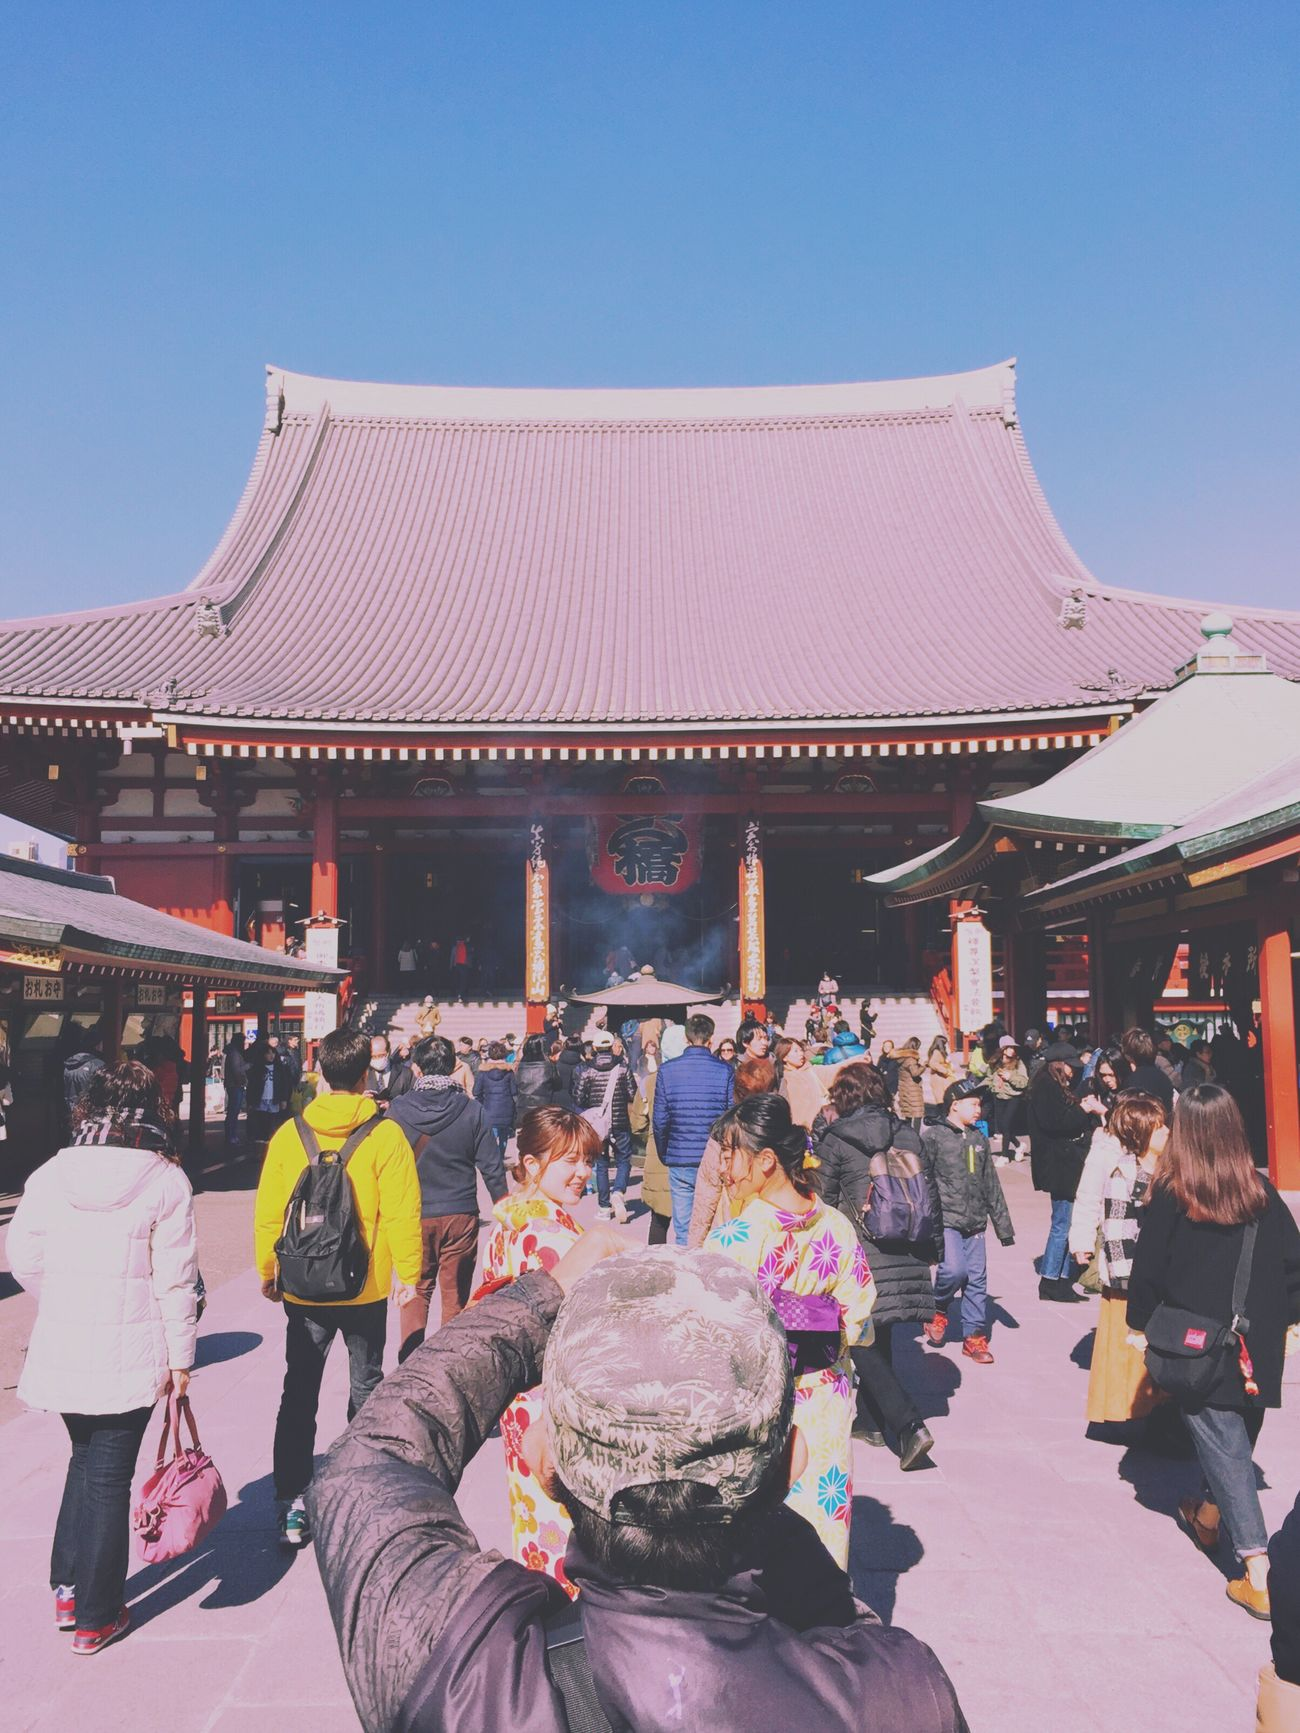 Real People Spirituality Tradition Leisure Activity Outdoors Religion Lifestyles Japan Asakusa Eyem Best Shots Mobilephotography Snapshots Of Life Streetphotography